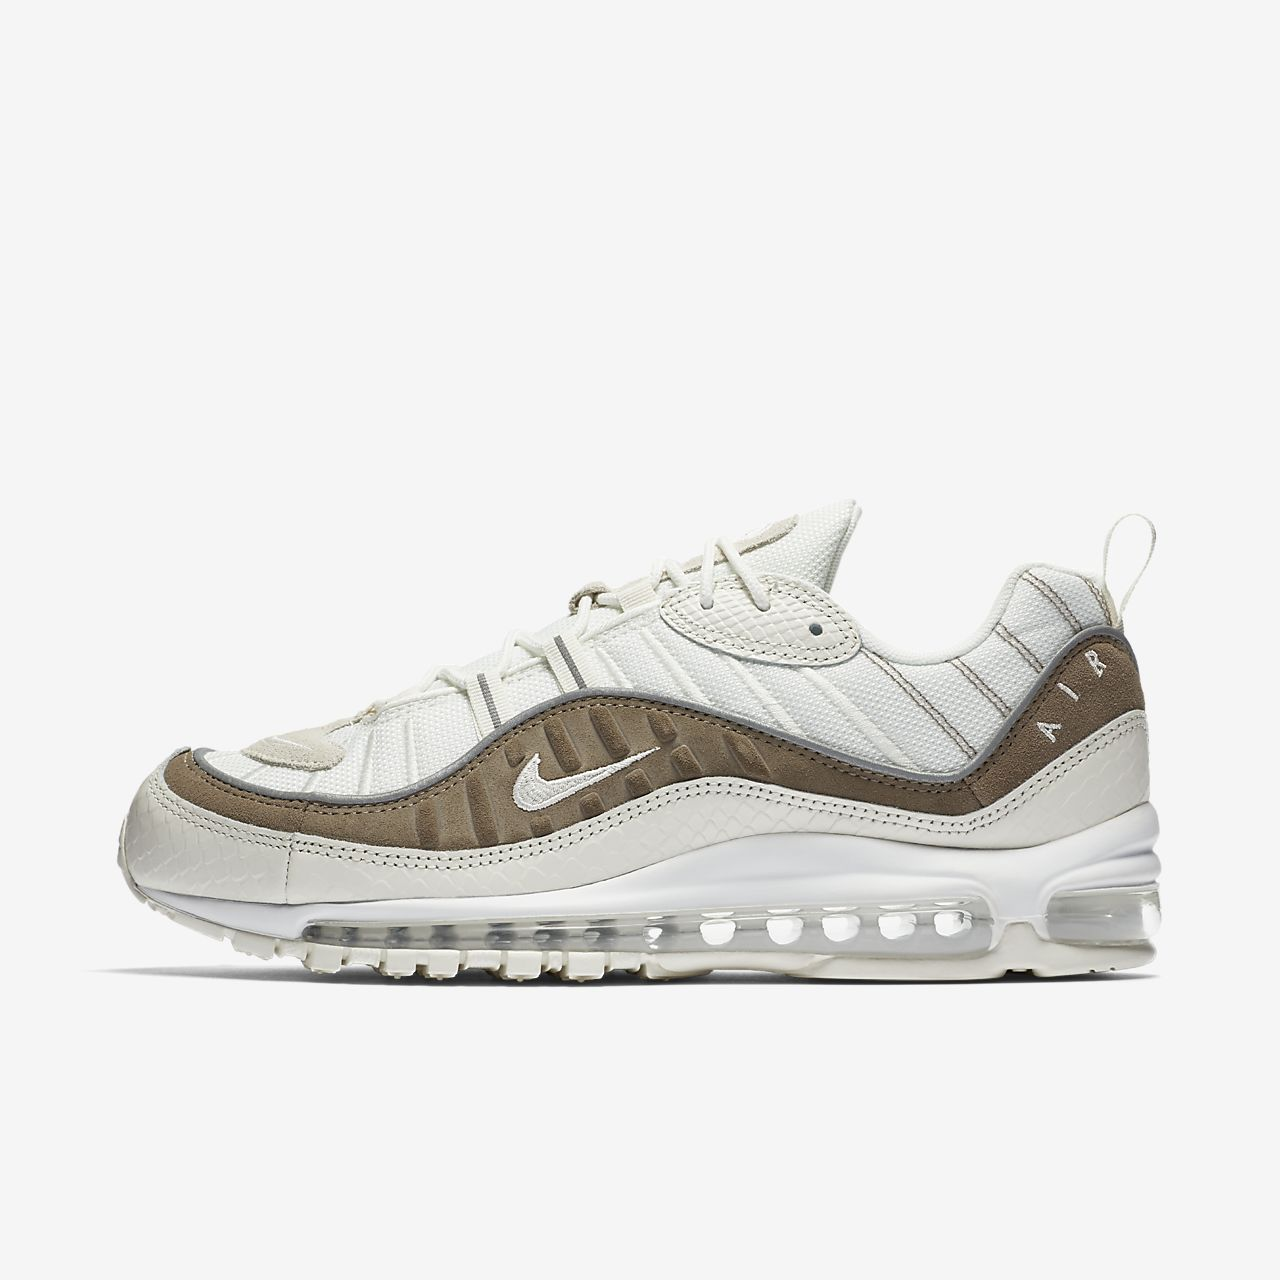 ... Chaussure Nike Air Max 98 SE pour Homme